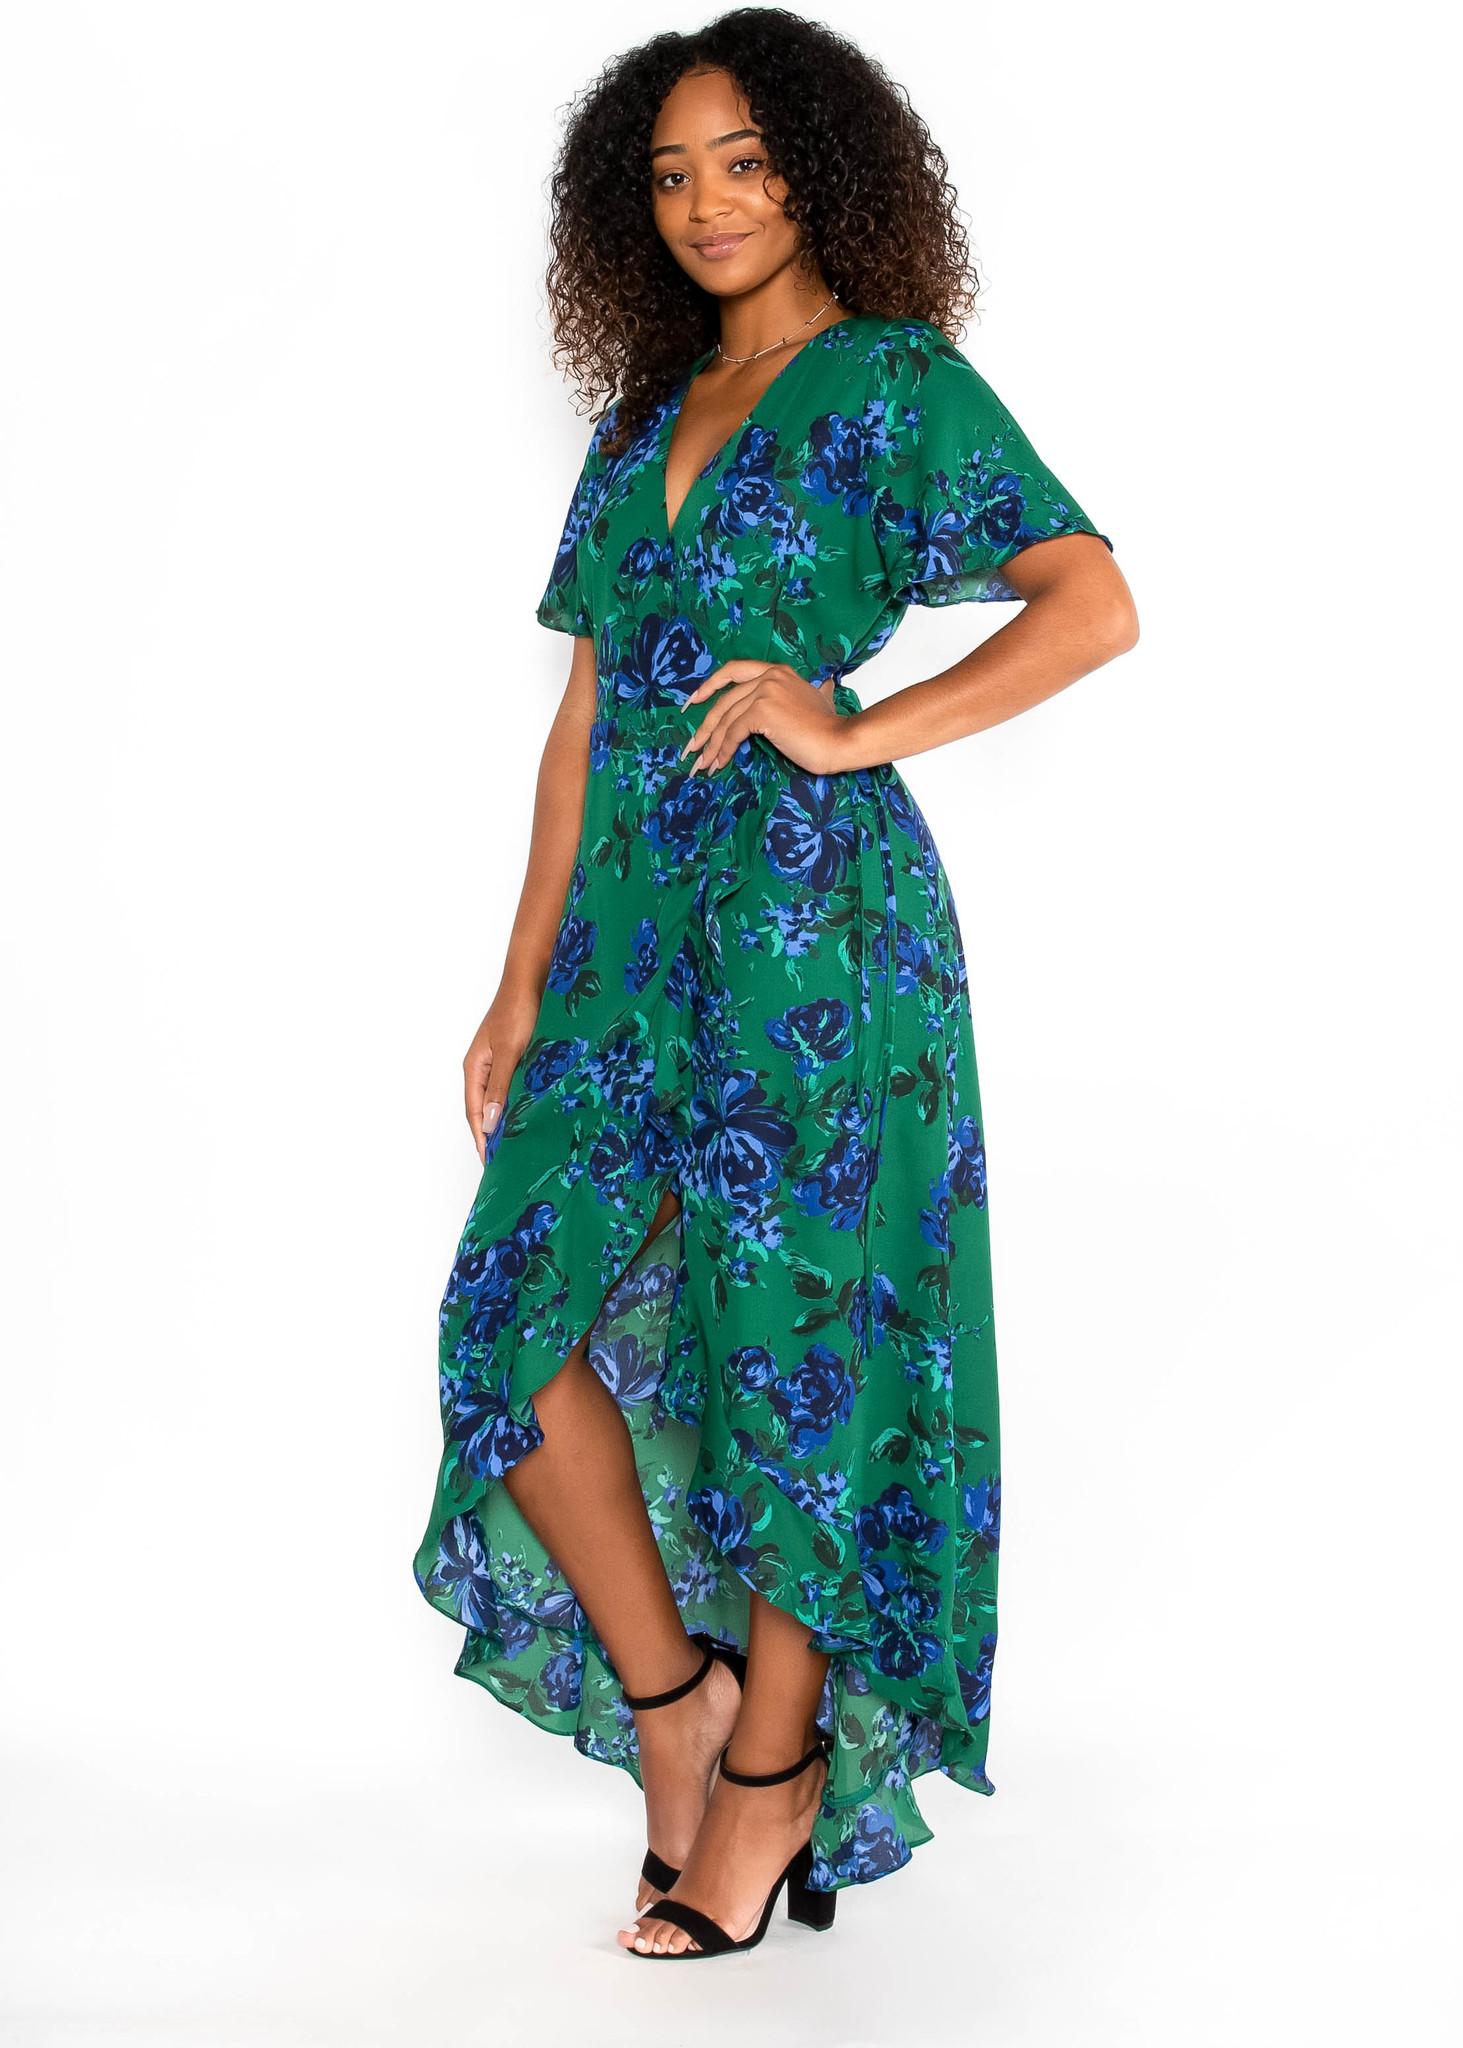 ROMANTIC GETAWAY FLORAL DRESS